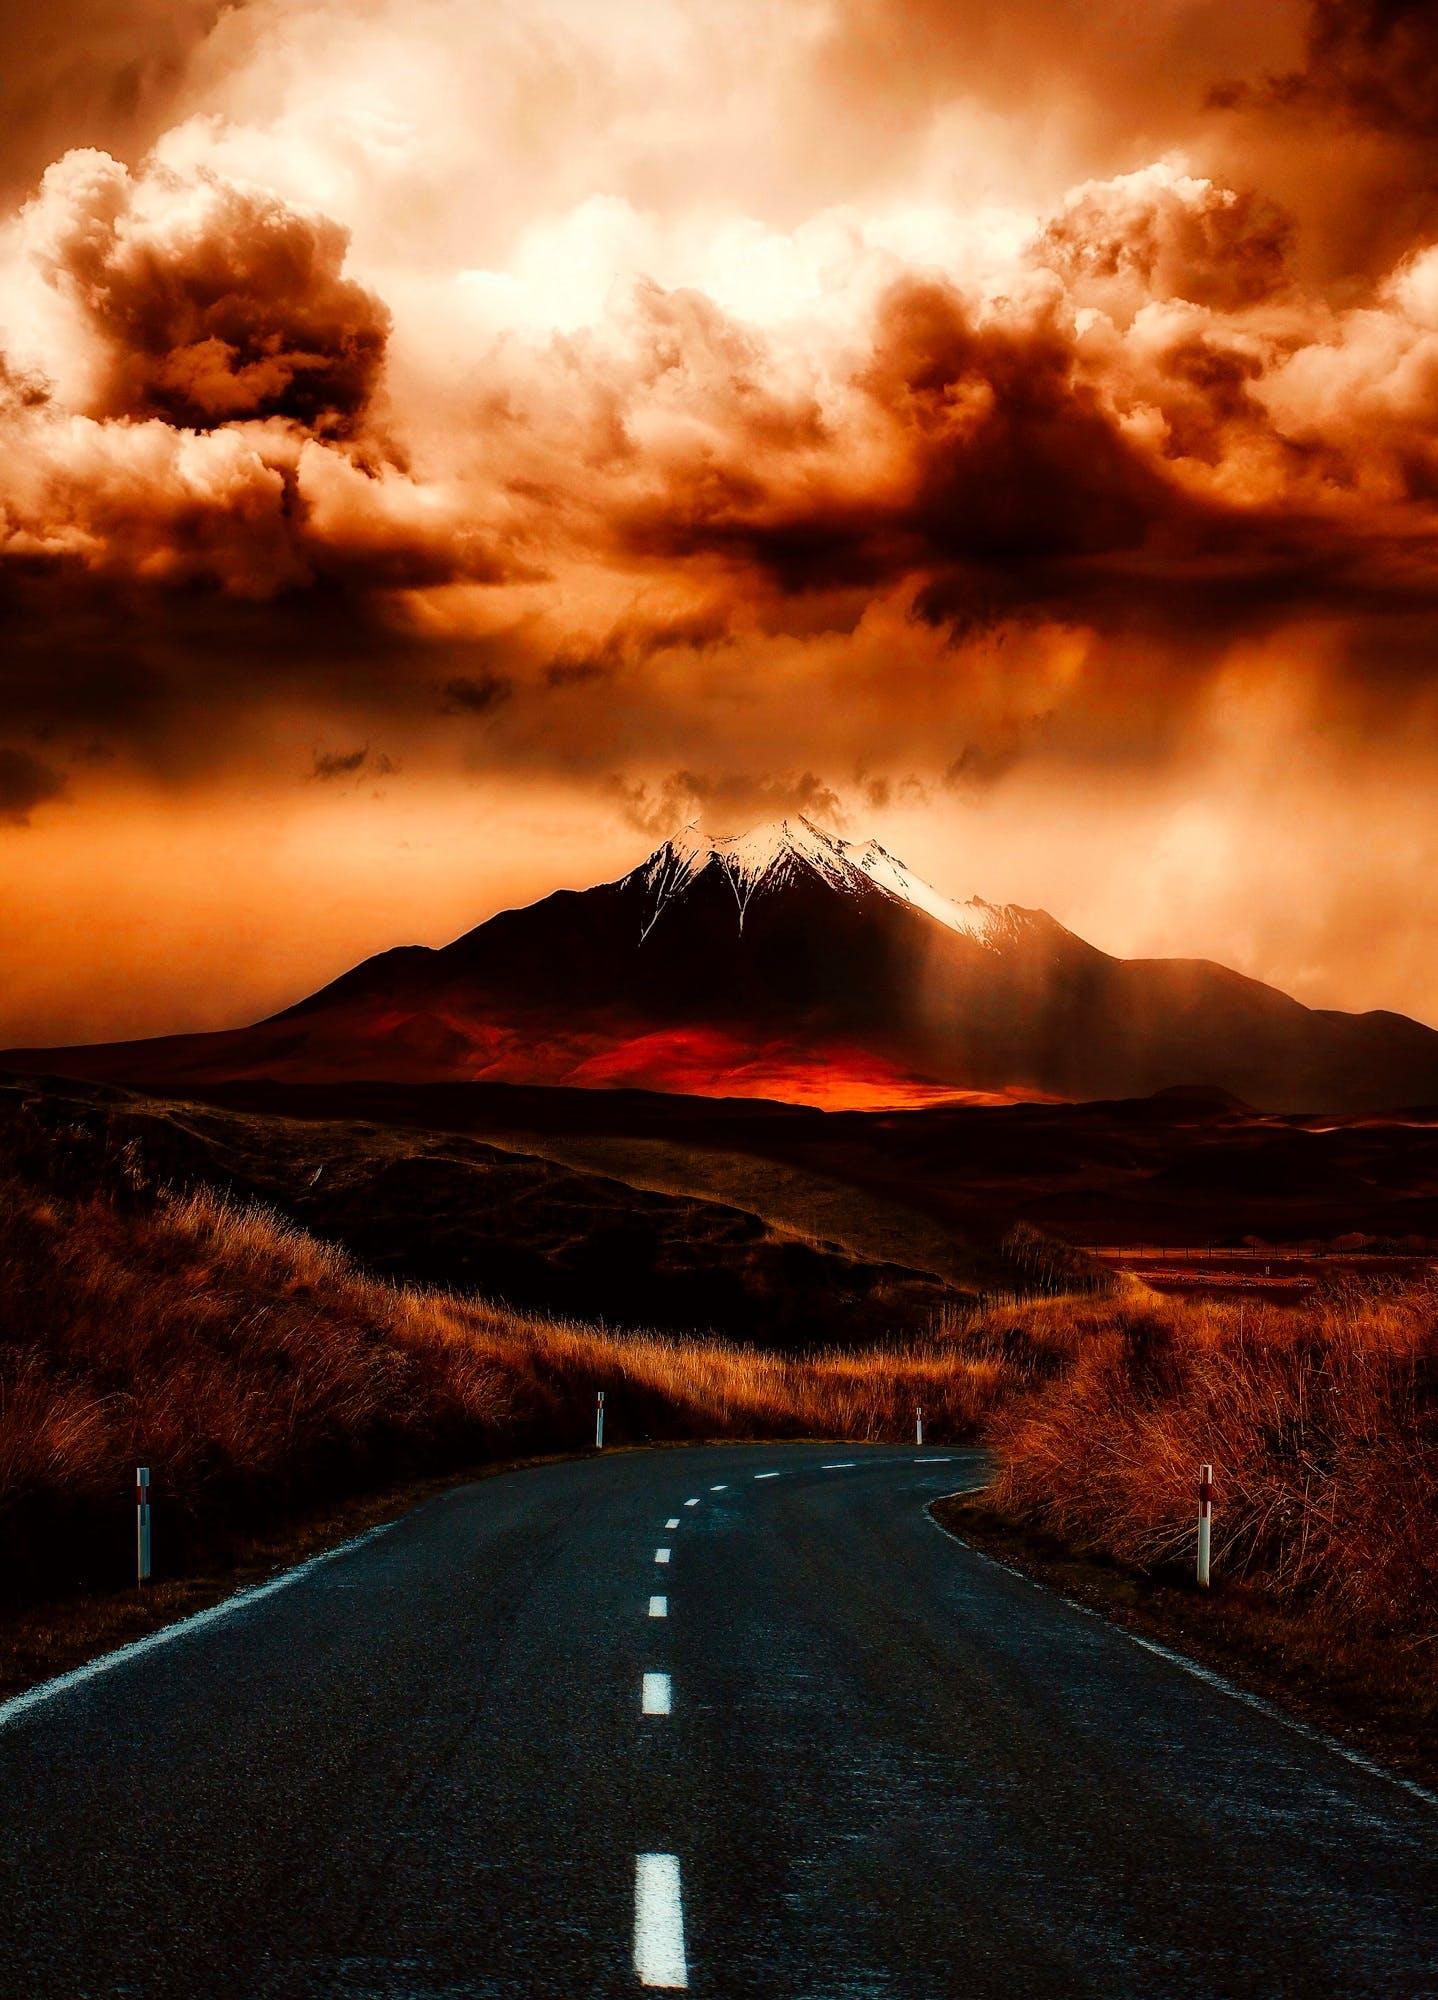 abend, autobahn, berg